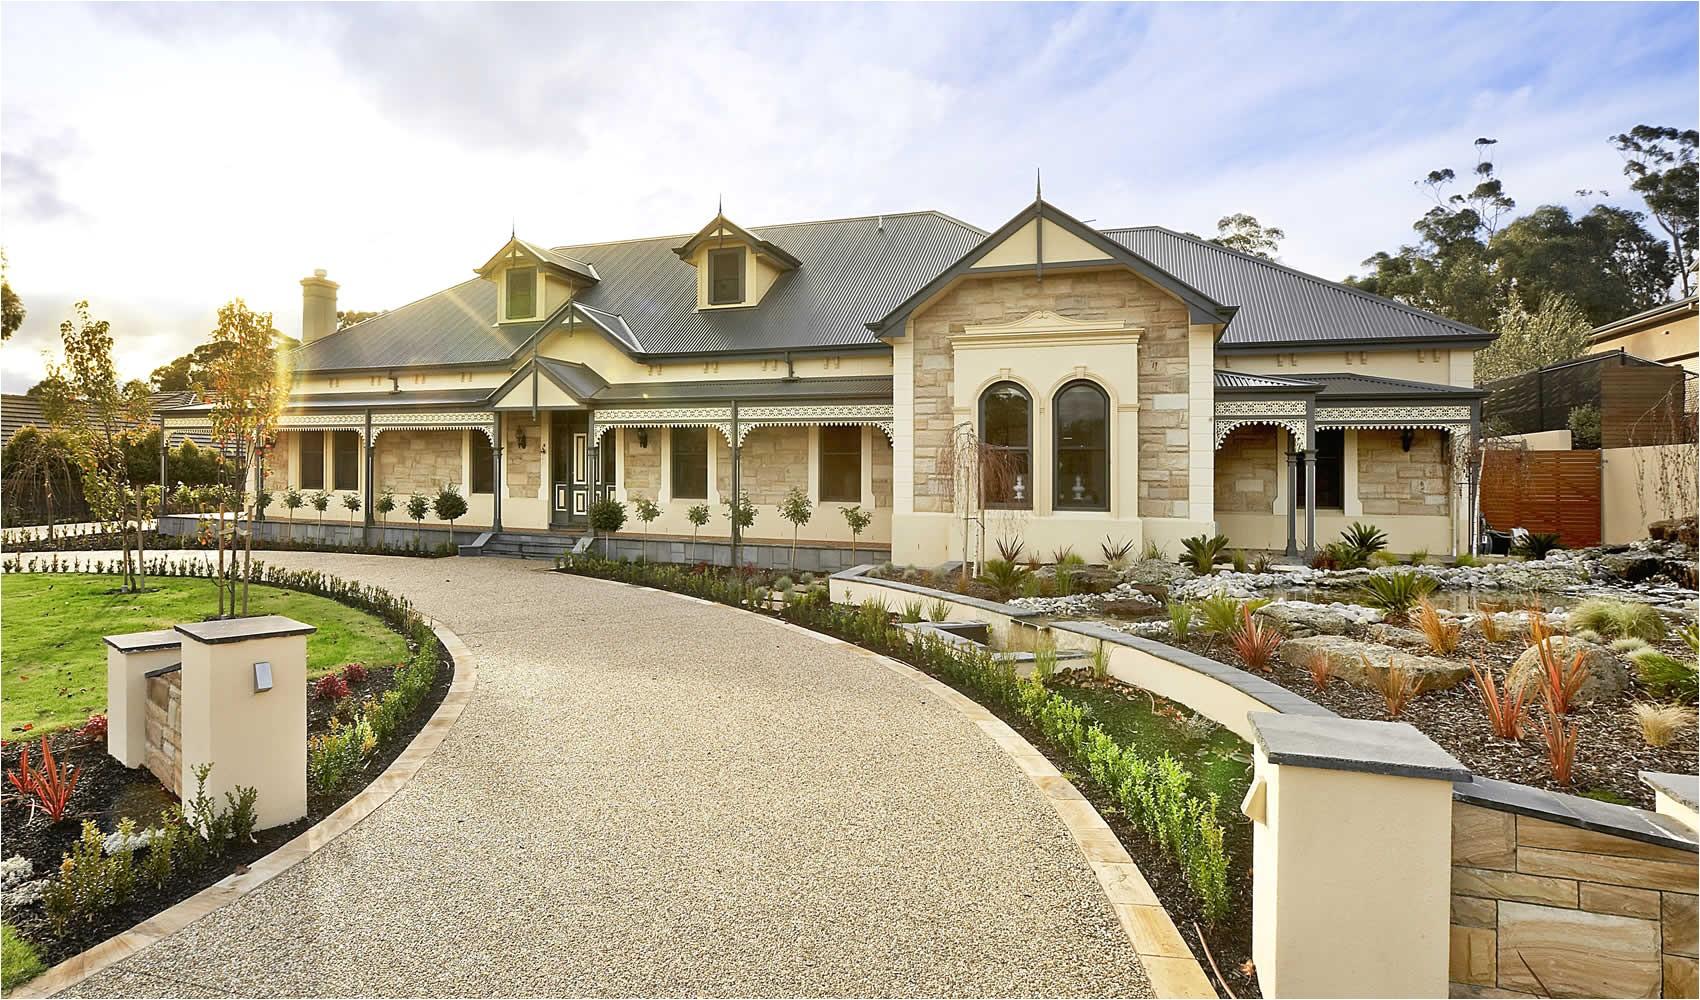 federation home plans australia